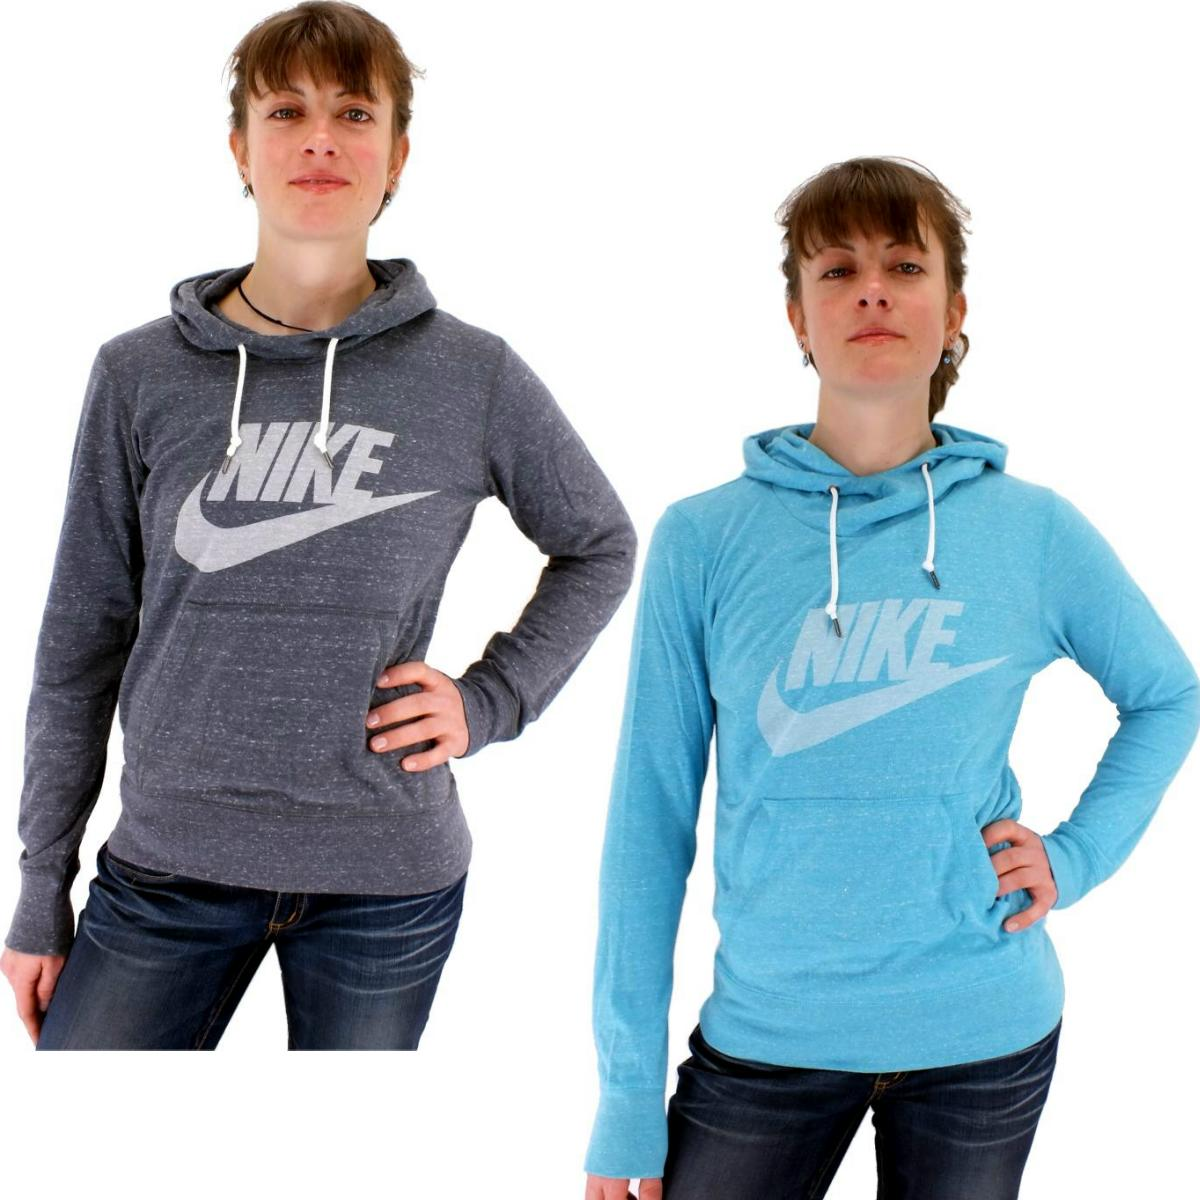 nike gym vintage hoody damen pullover kapuzenpullover sweatshirt grau blau ebay. Black Bedroom Furniture Sets. Home Design Ideas